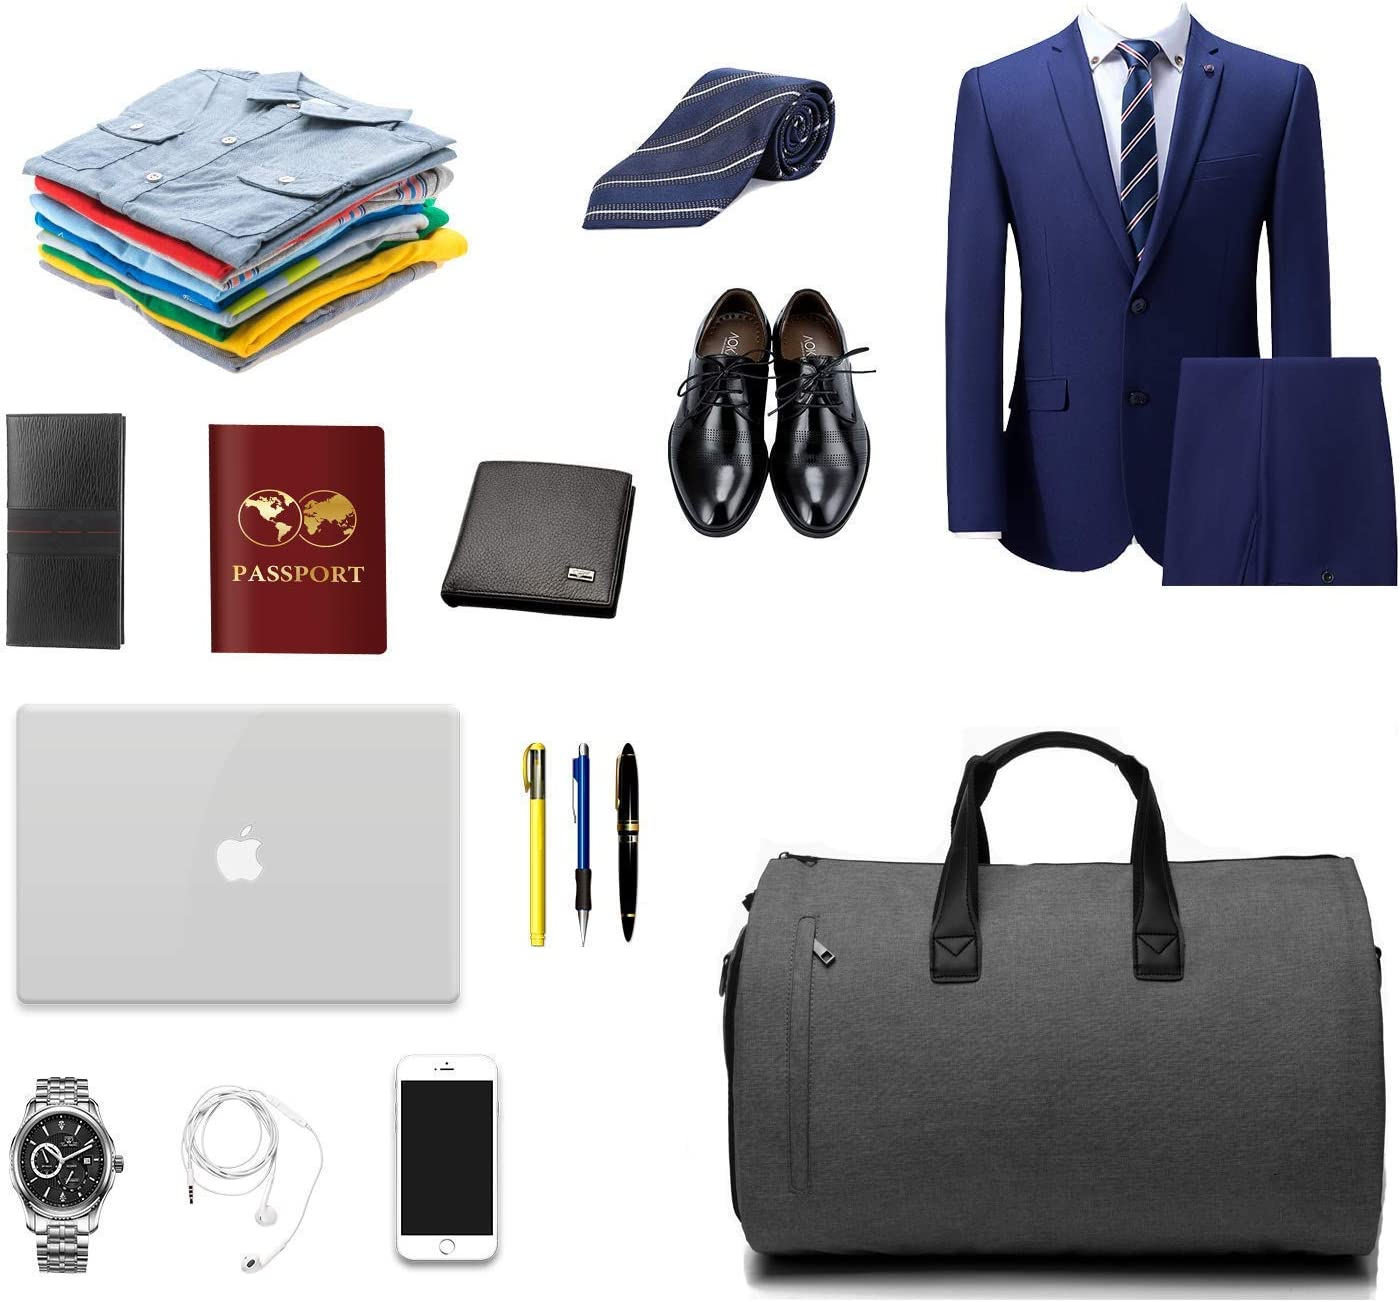 LILINSS Suit Storage Bag Mens Large-Capacity Folding Oxford Cloth Durable Portable Travel Bag Travel Storage Bag with Shoe Warehouse 45L